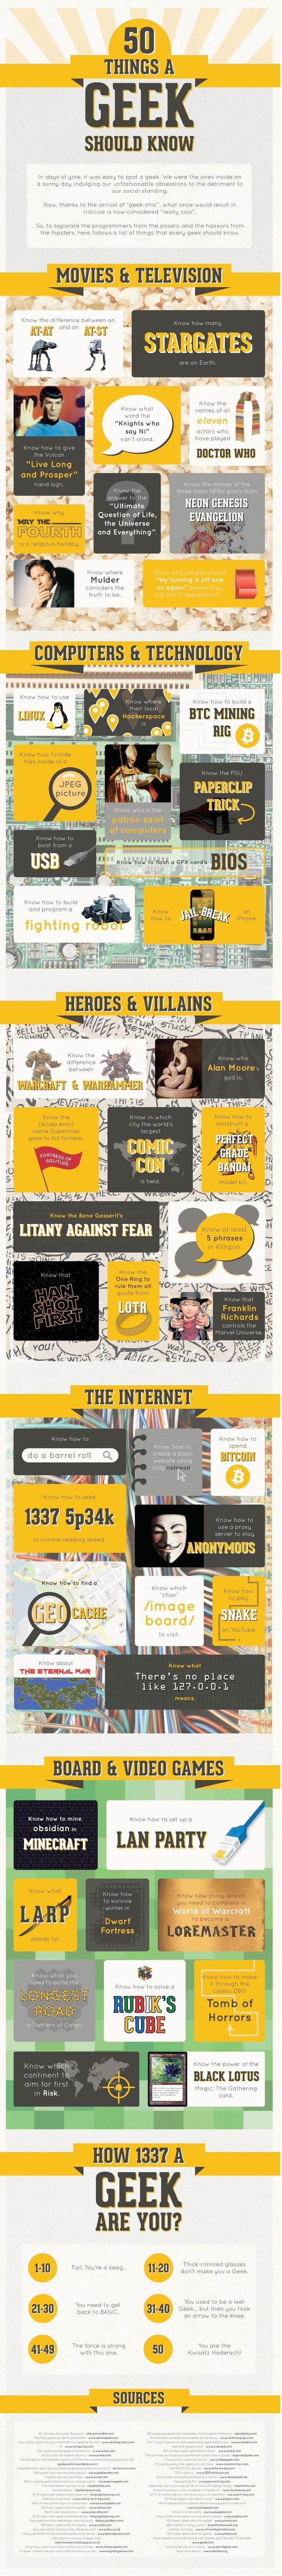 50 things a #geek should know #infographic via @Hannah Mestel Mestel Mestel Morgan